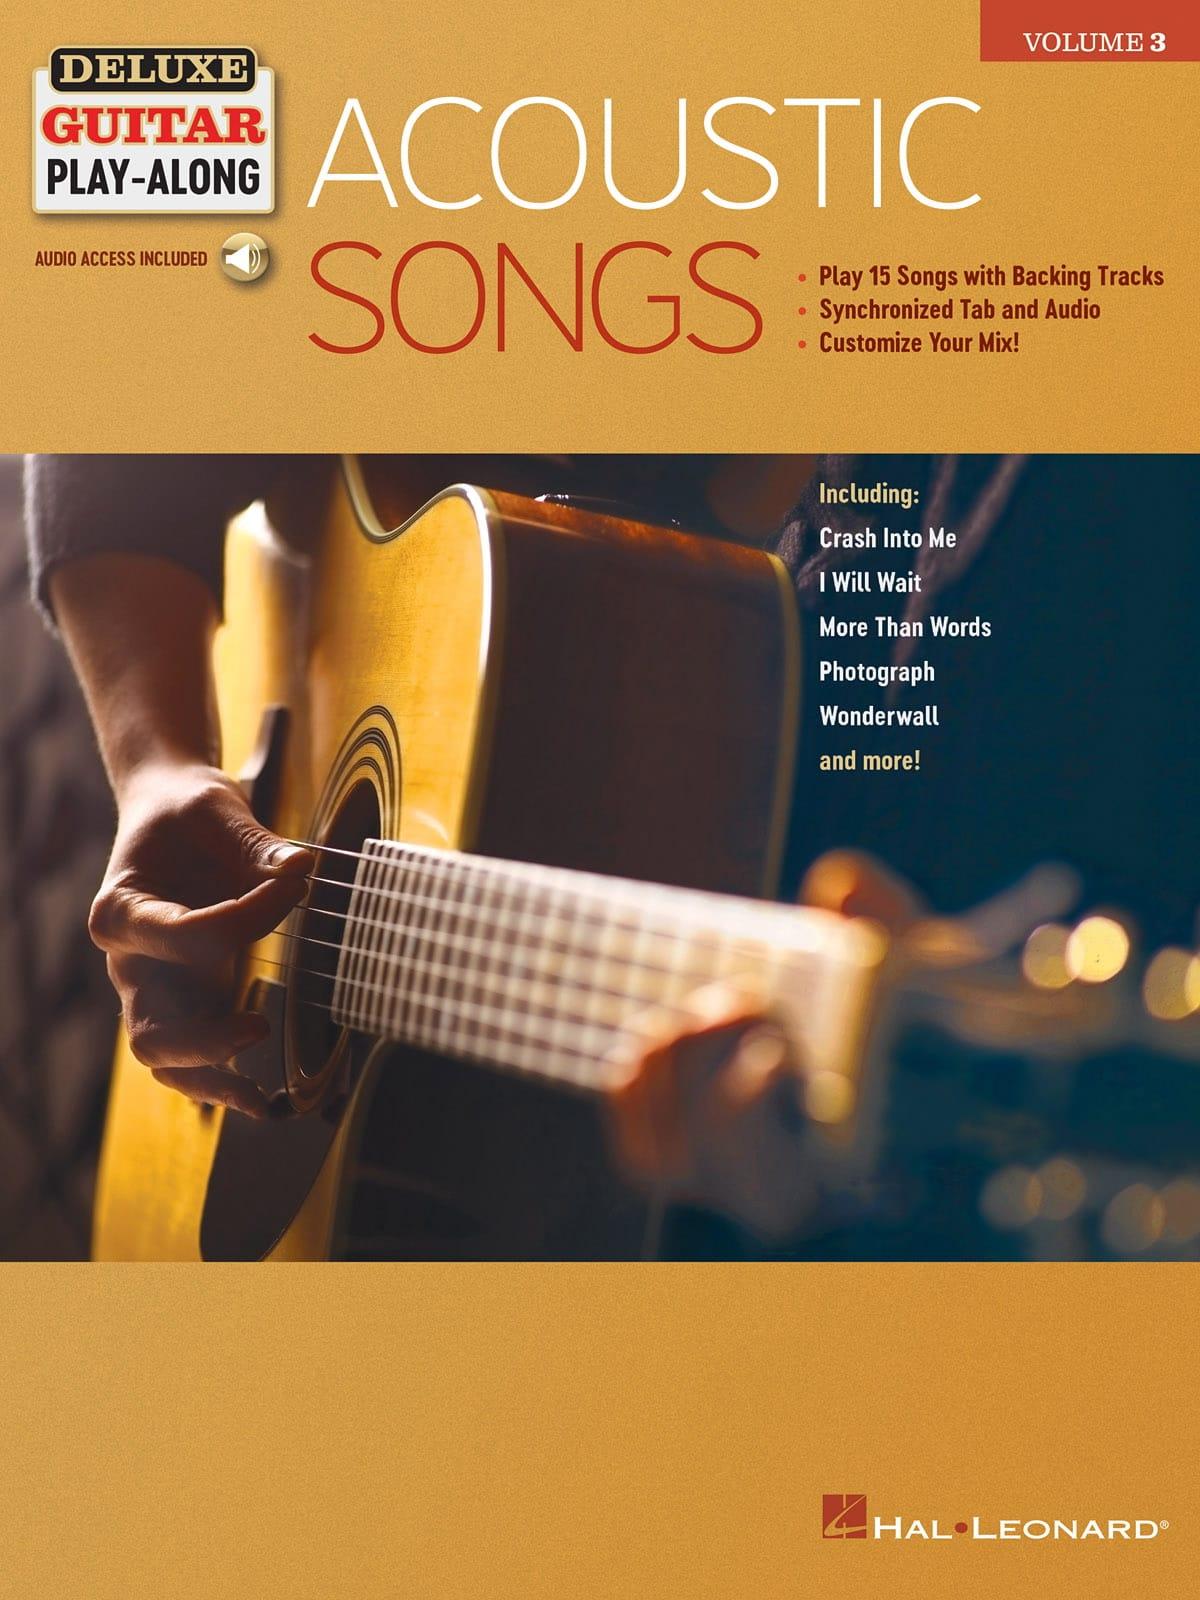 Deluxe Guitar Play-Along Volume 3 - Acoustic Songs - laflutedepan.com